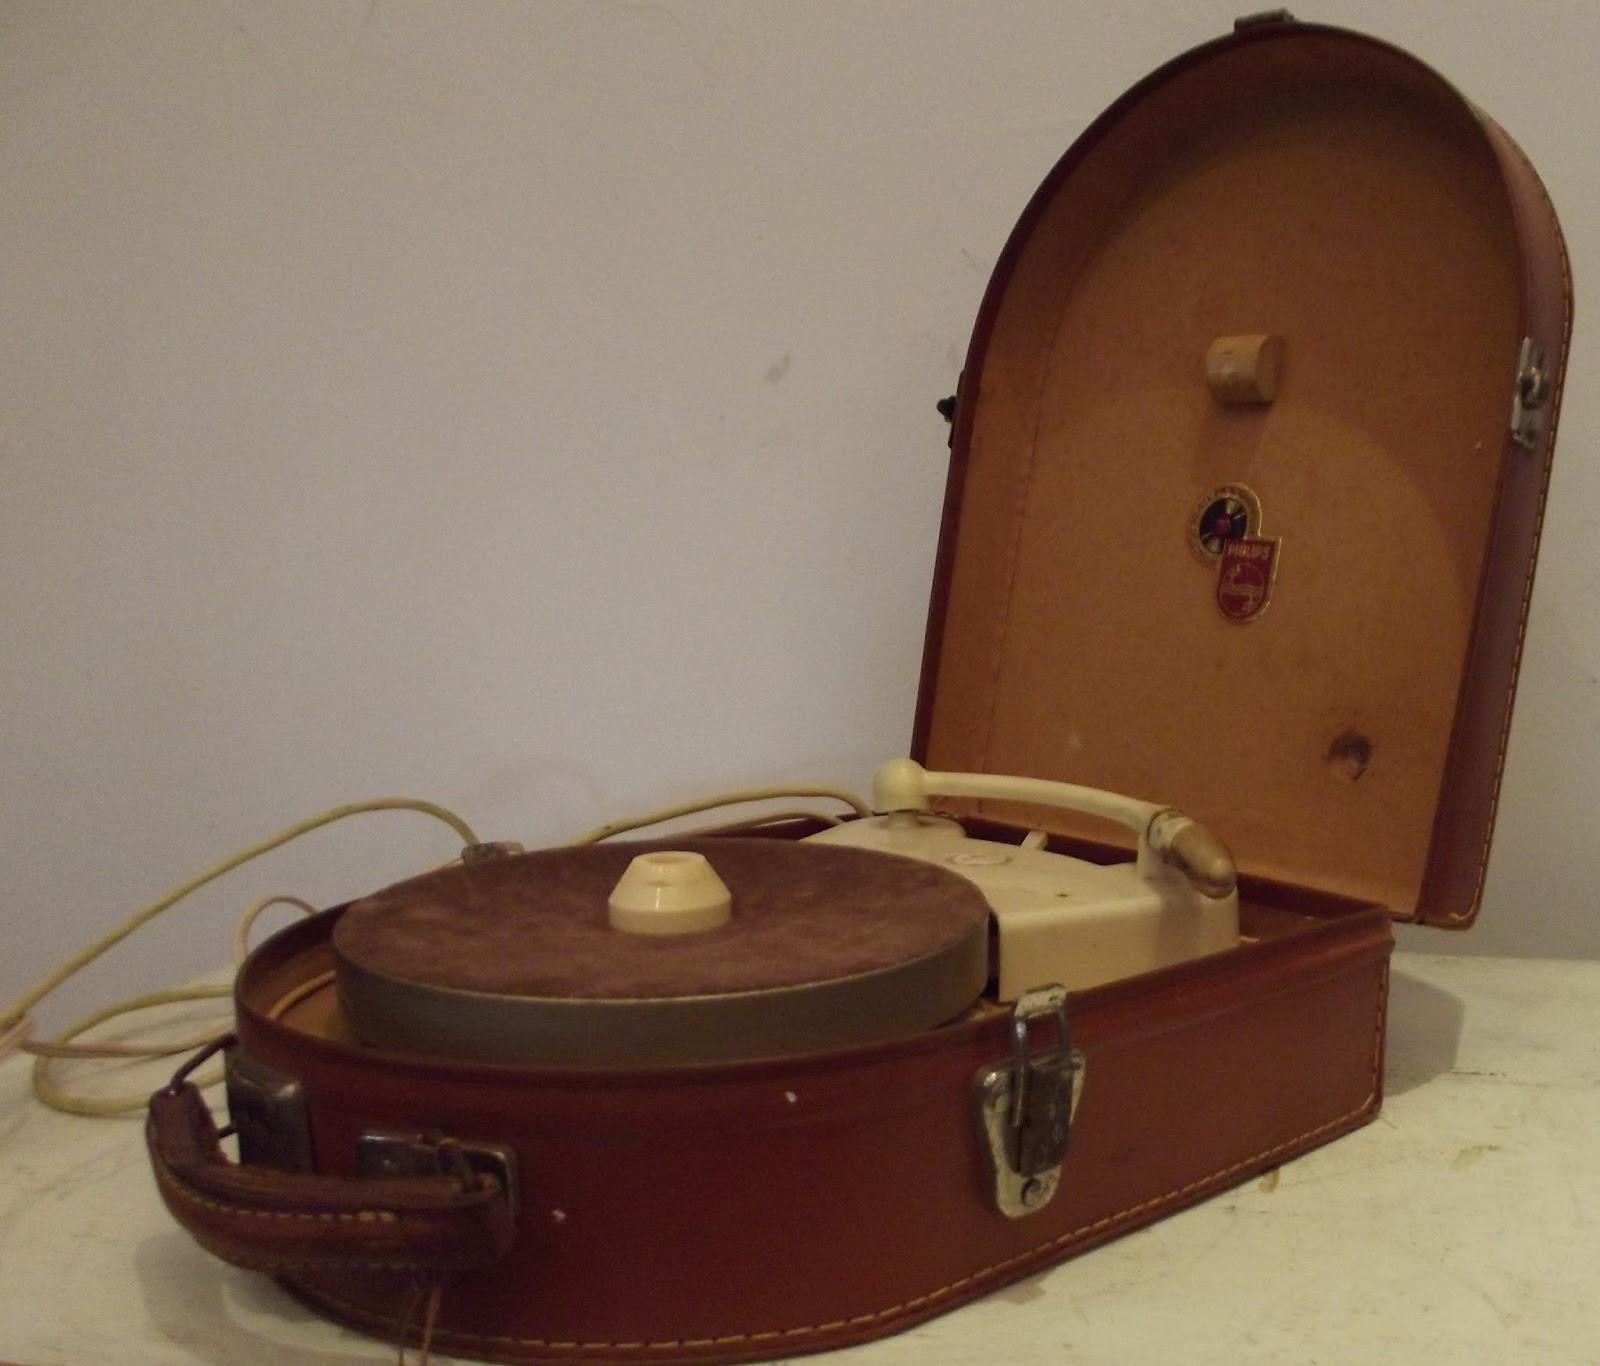 ancien lectrophone pick up tourne disque philips multigroove vintage 50s ebay. Black Bedroom Furniture Sets. Home Design Ideas